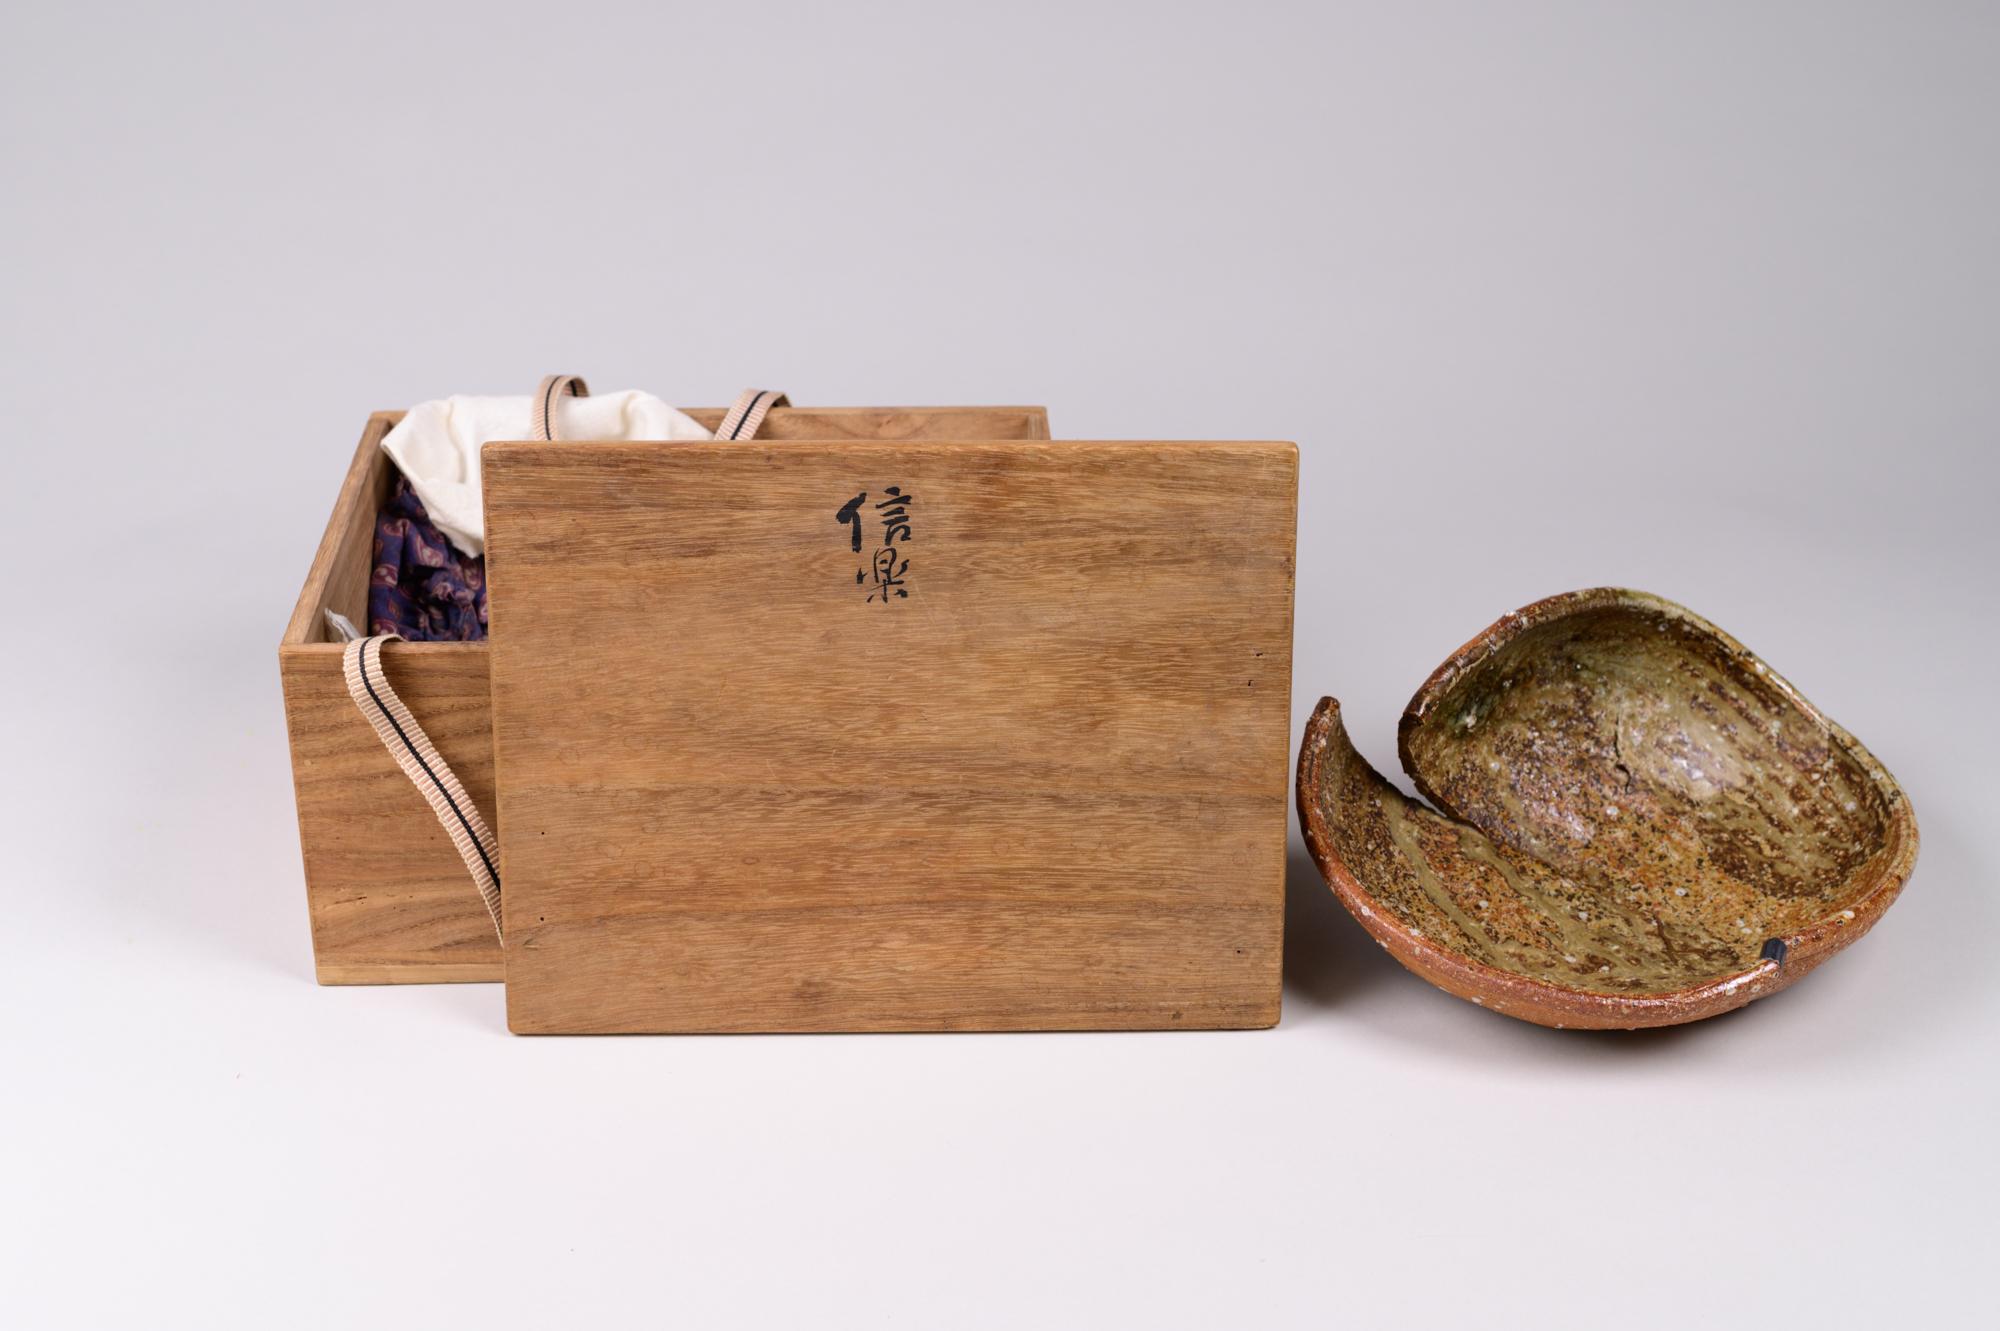 Japanese ceramic, Kintsugi, Japanese Kintsugi, Shigaraki, kintsugi ceramic, Shigaraki plate, antique plate, antique ceramic plate